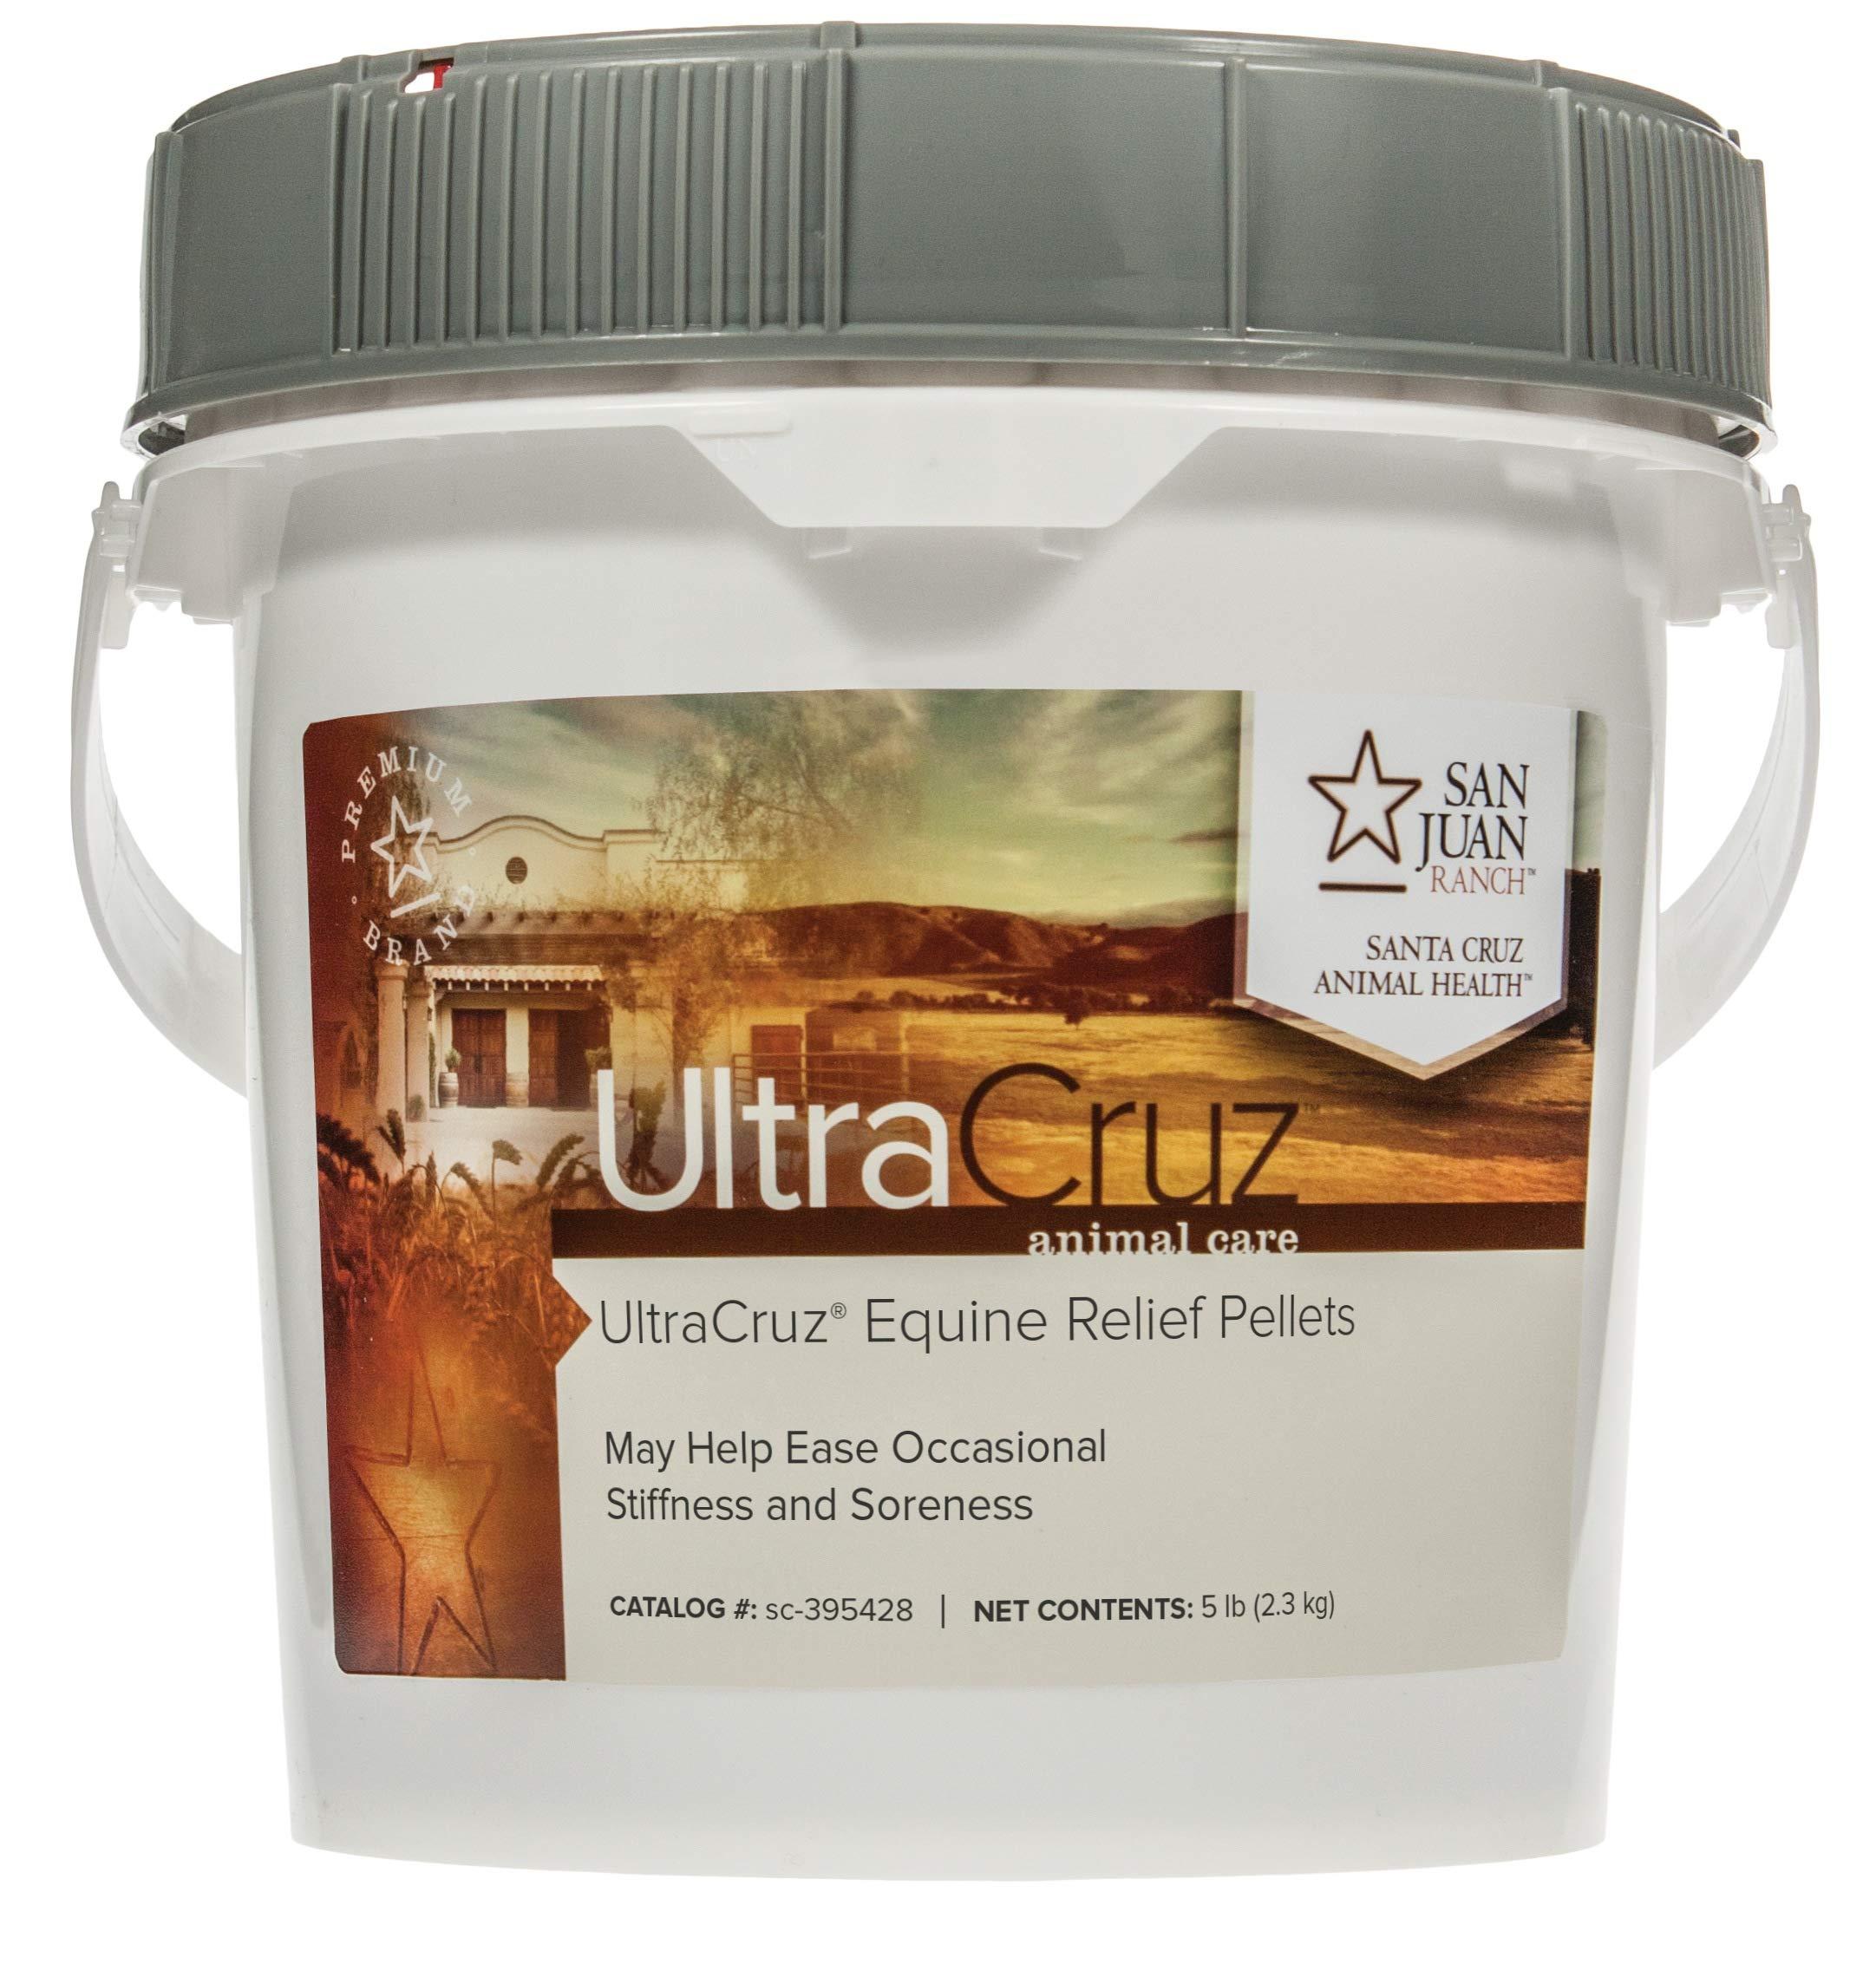 UltraCruz Equine Relief Supplement for Horses, 5 lb. Pellets (80 Day Supply)